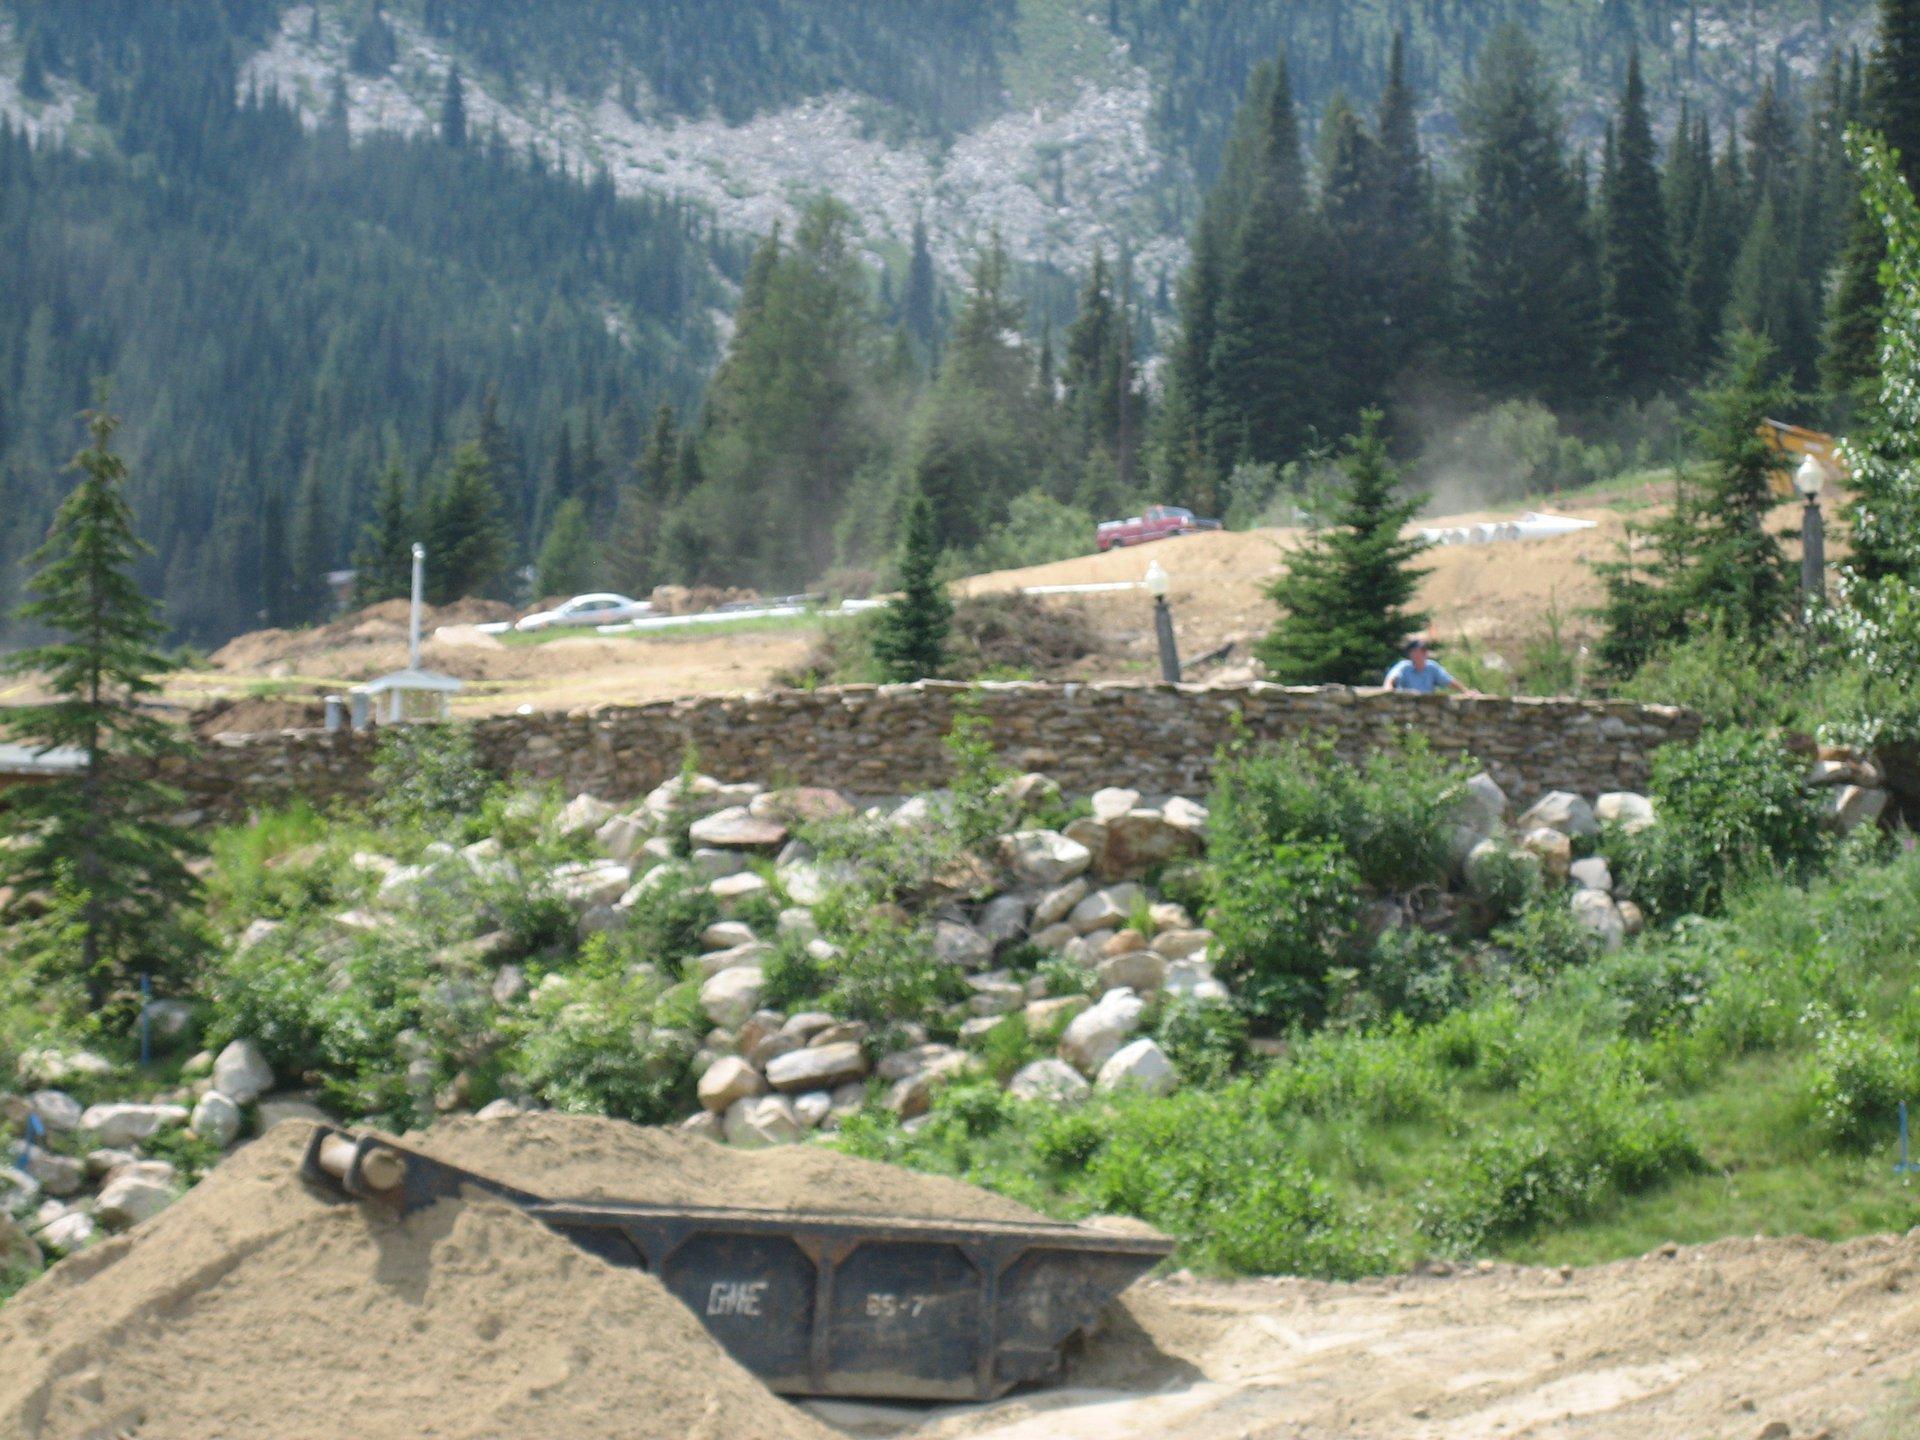 Construction at Schweitzer Mountain Resort, Summer 2007 - 2 of 8